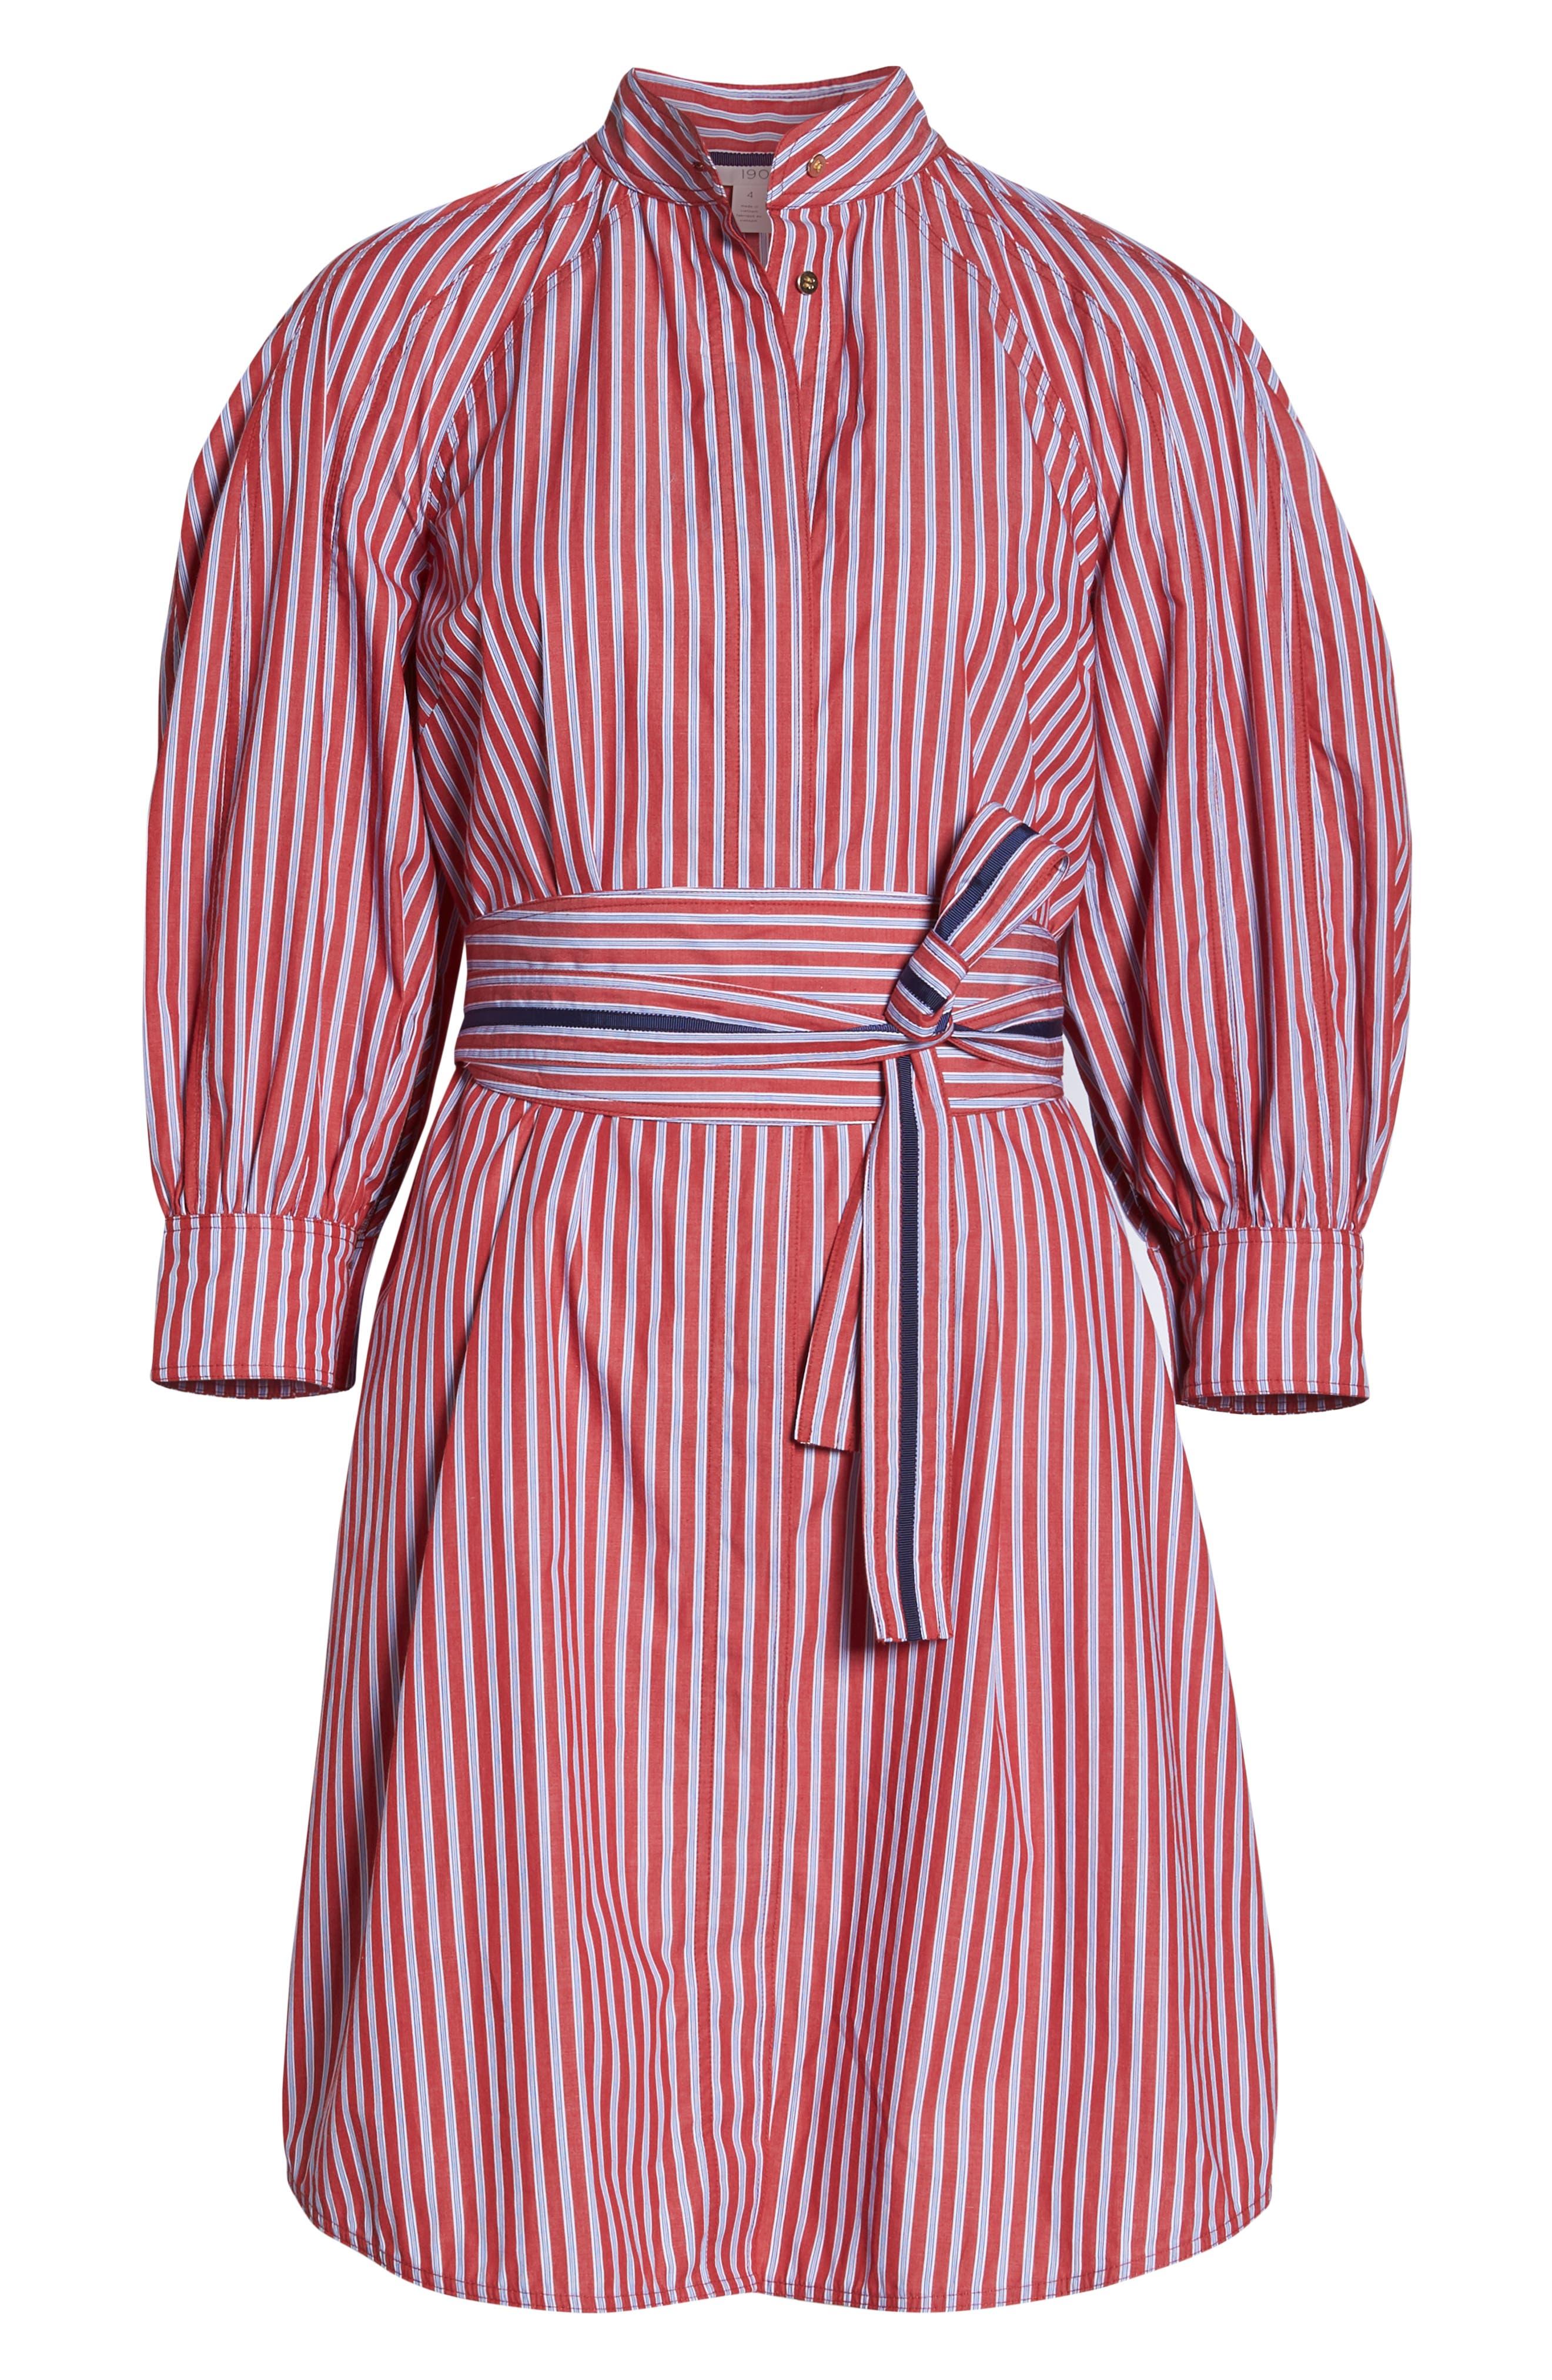 Stripe Tie Waist Shirtdress,                             Alternate thumbnail 7, color,                             600